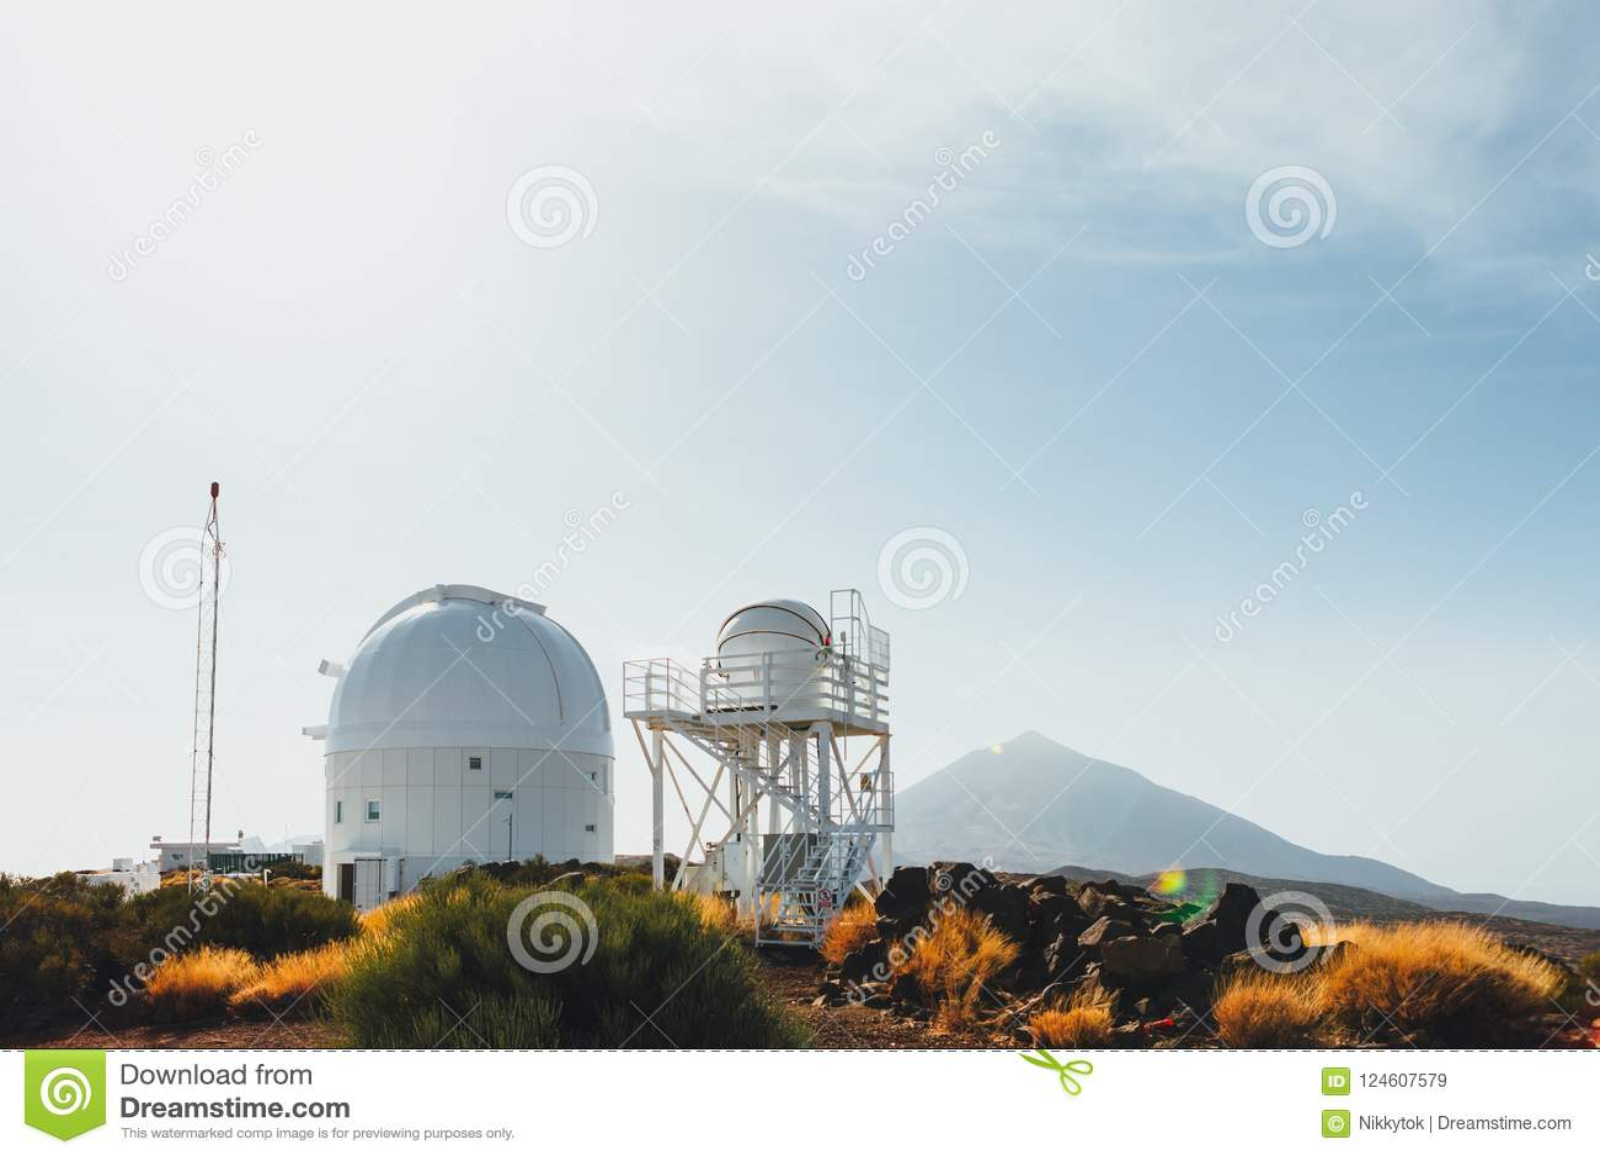 Astronomische teleskope teide observatoriums in teneriffa